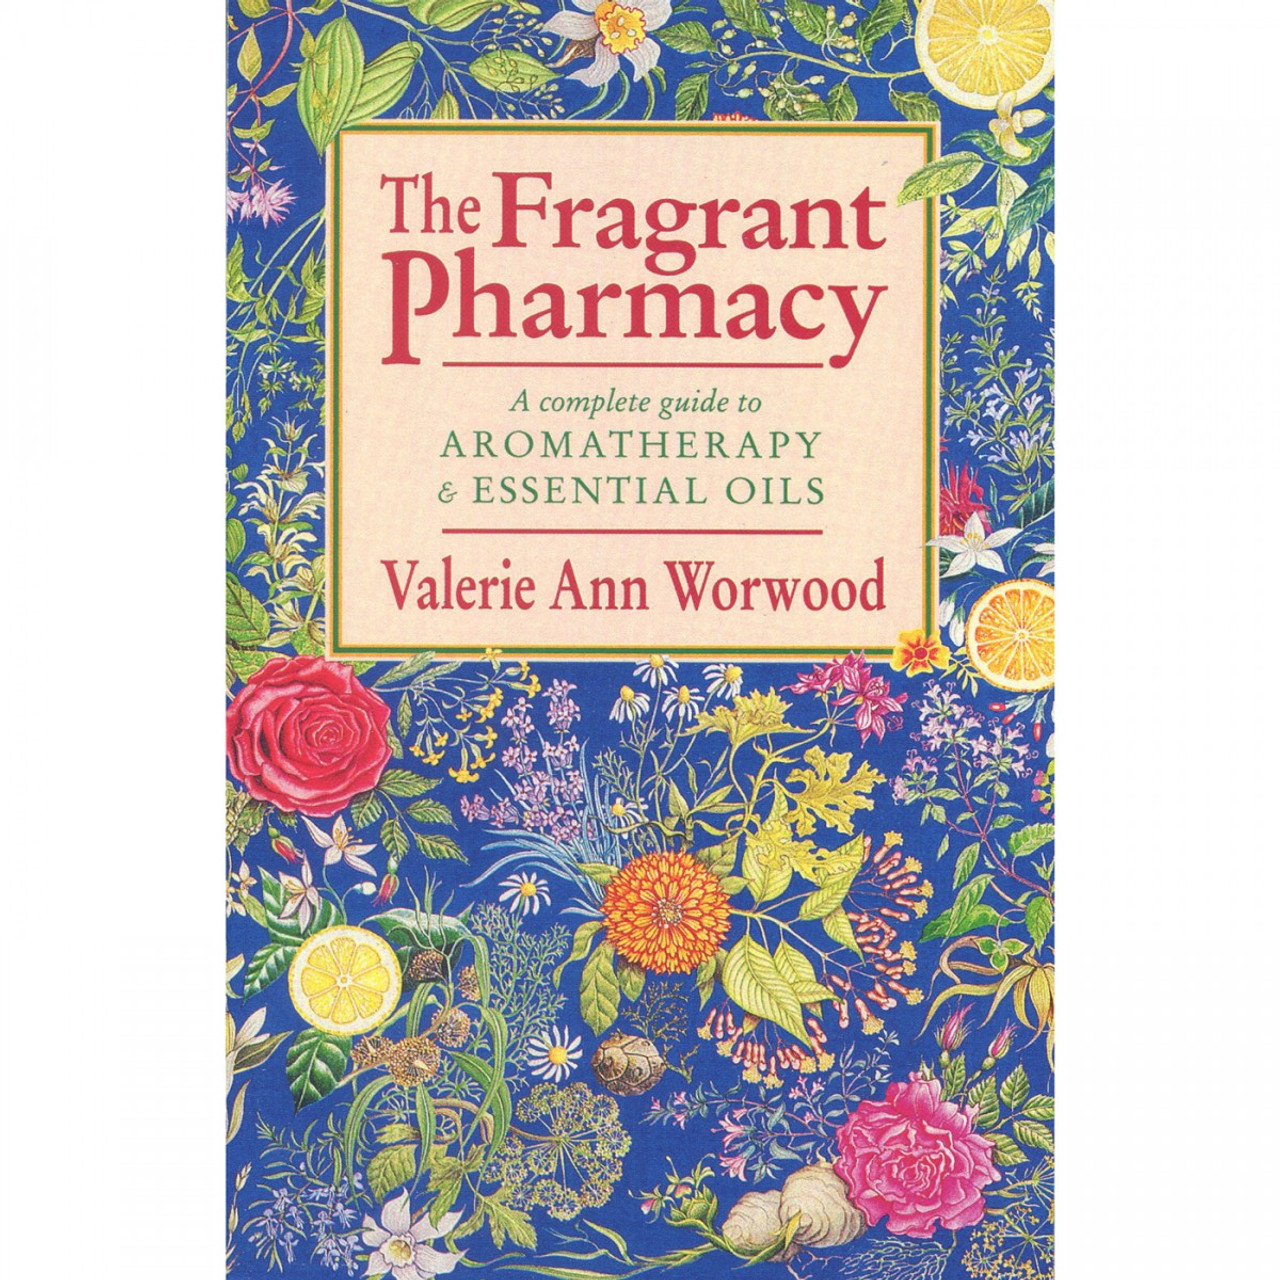 The Fragrant Pharmacy by Valerie Ann Worwood